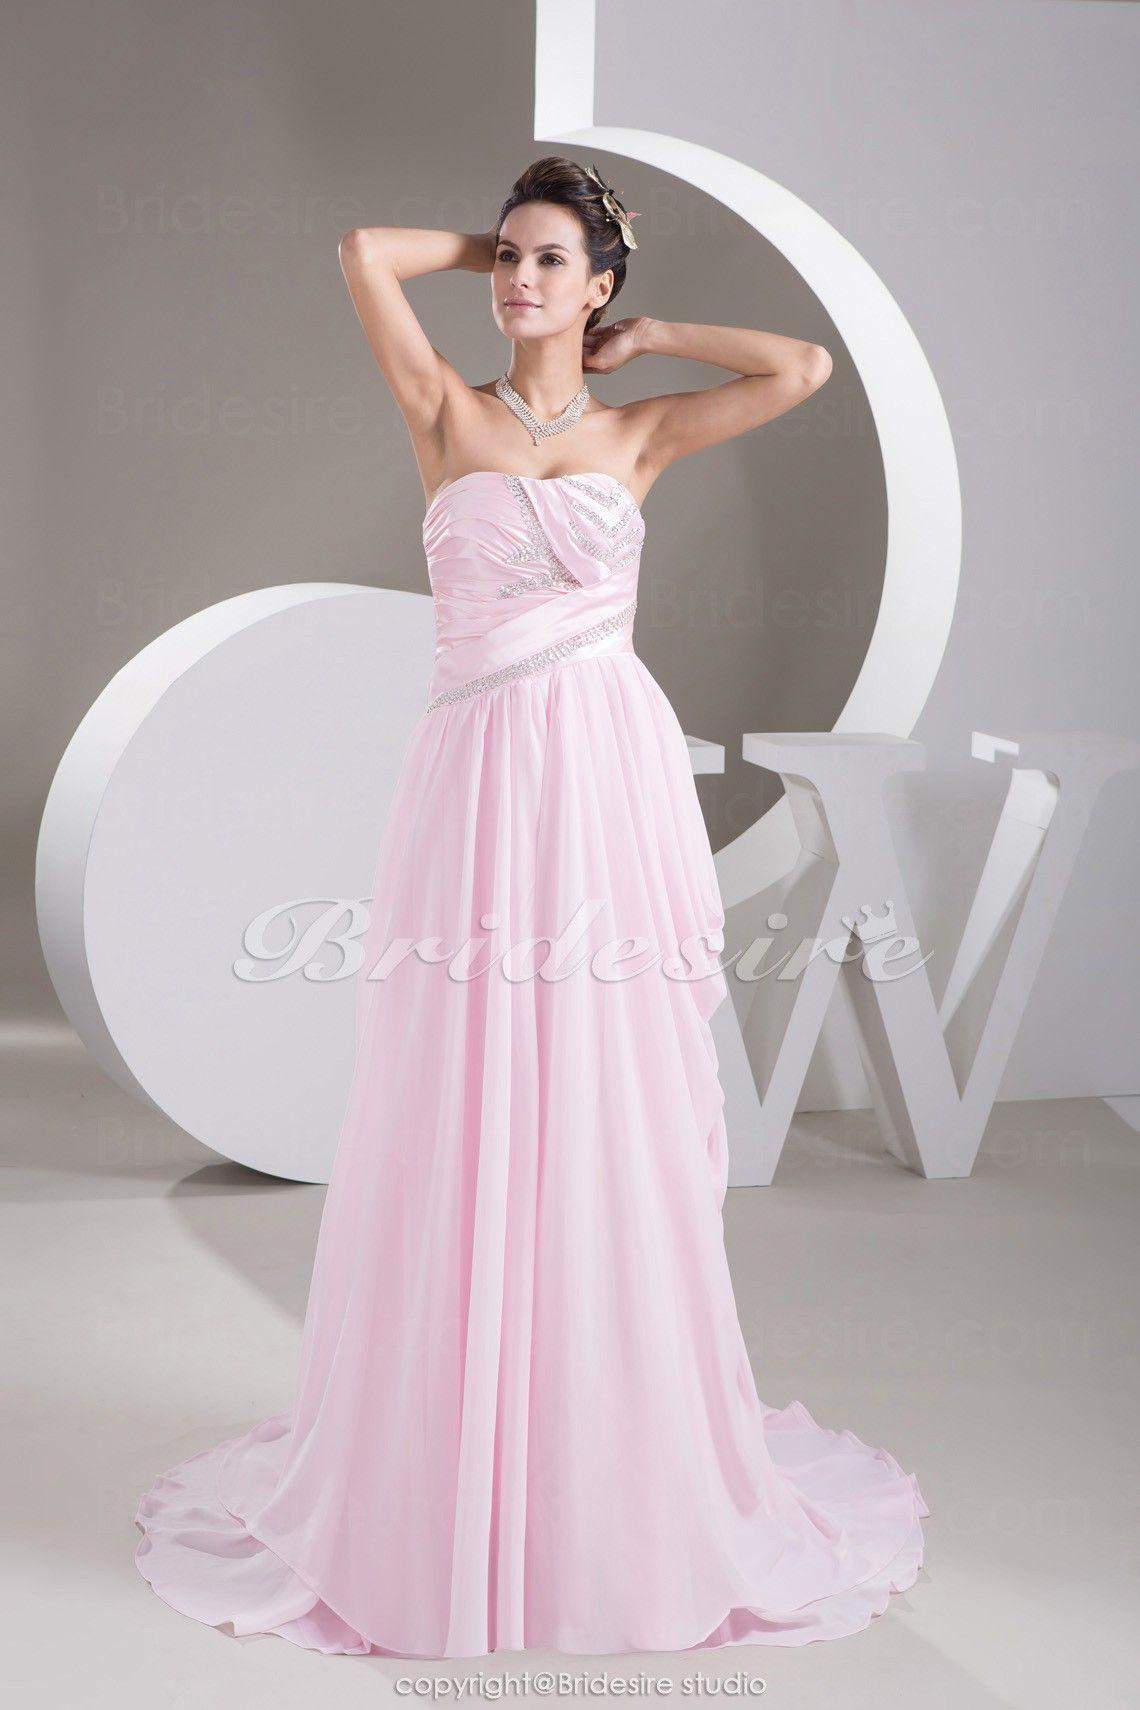 Sheath/Column Strapless Sweep/Brush Train Sleeveless Chiffon Stretch Satin Dress $211.99 Long Evening Dresses